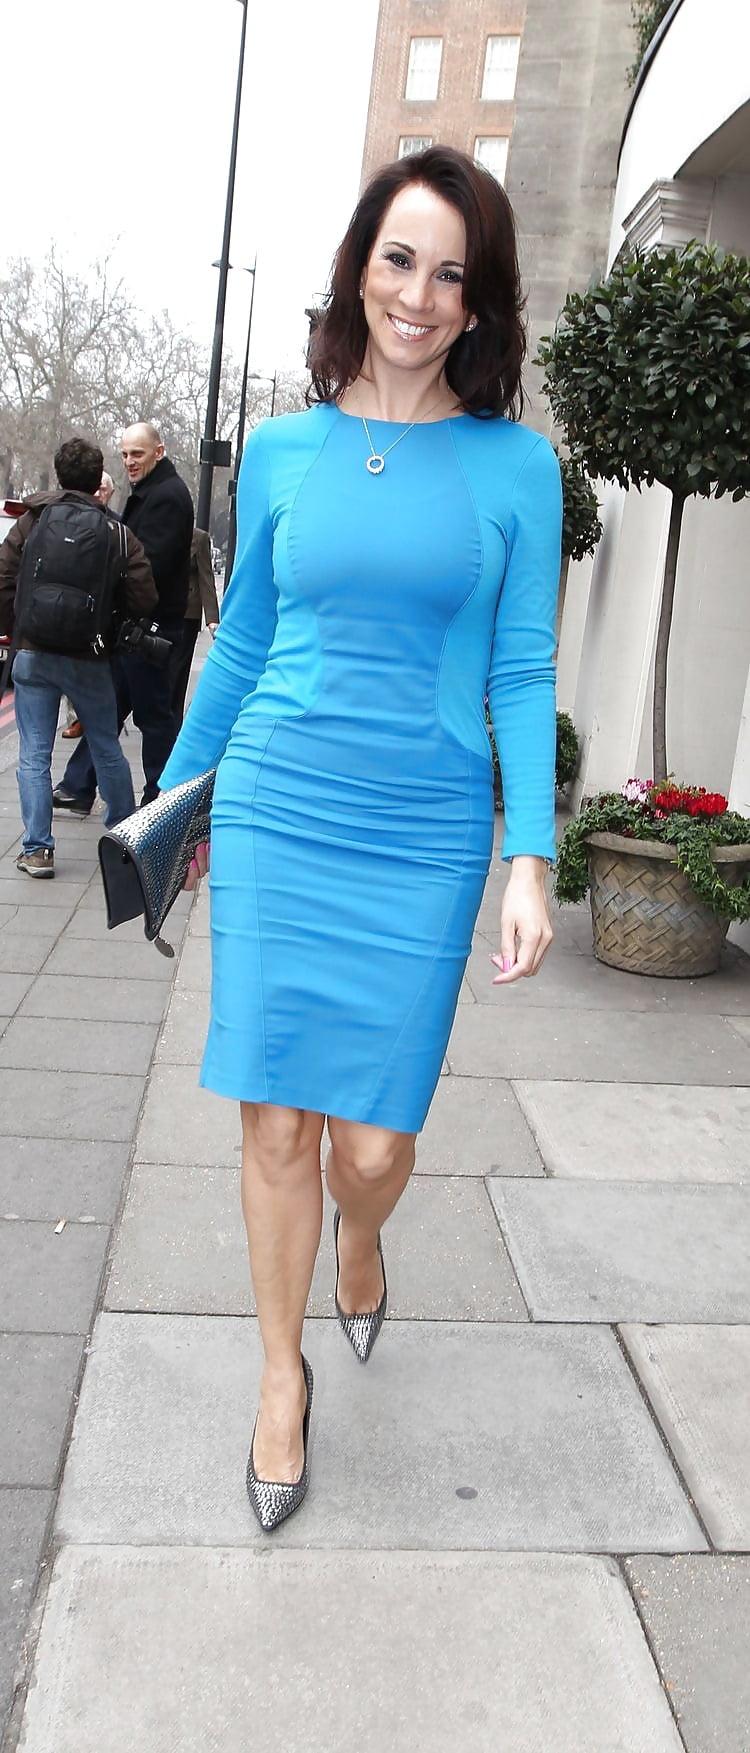 Andrea mclean mini skirt #12